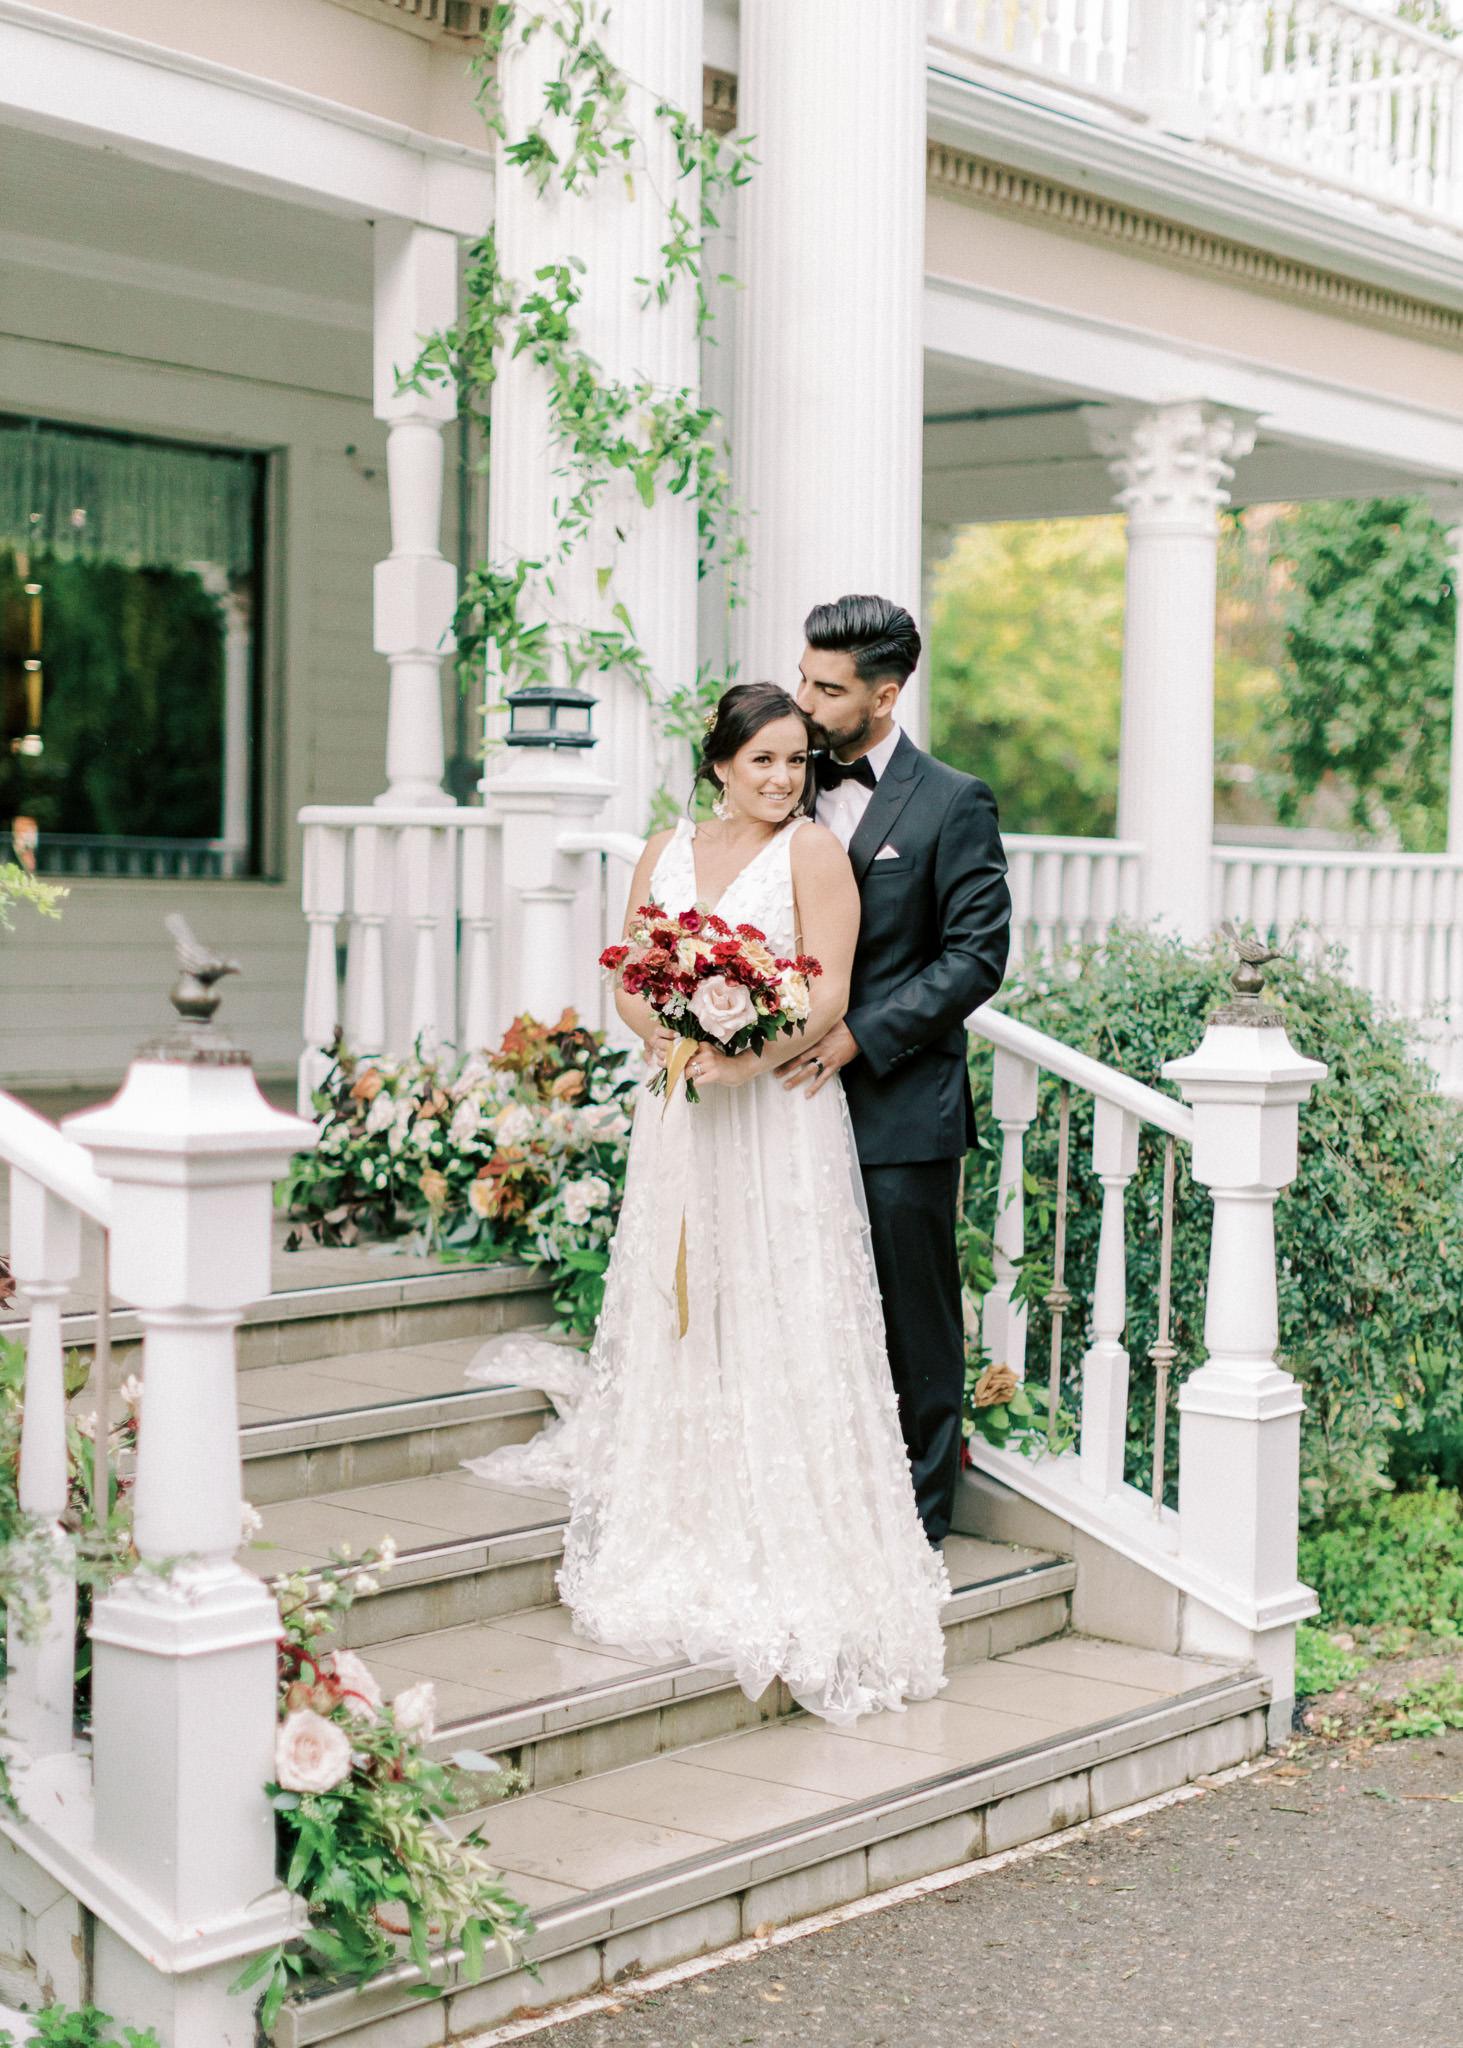 wedding pose taken at Bronte Bride's True-to-Hue Workshop